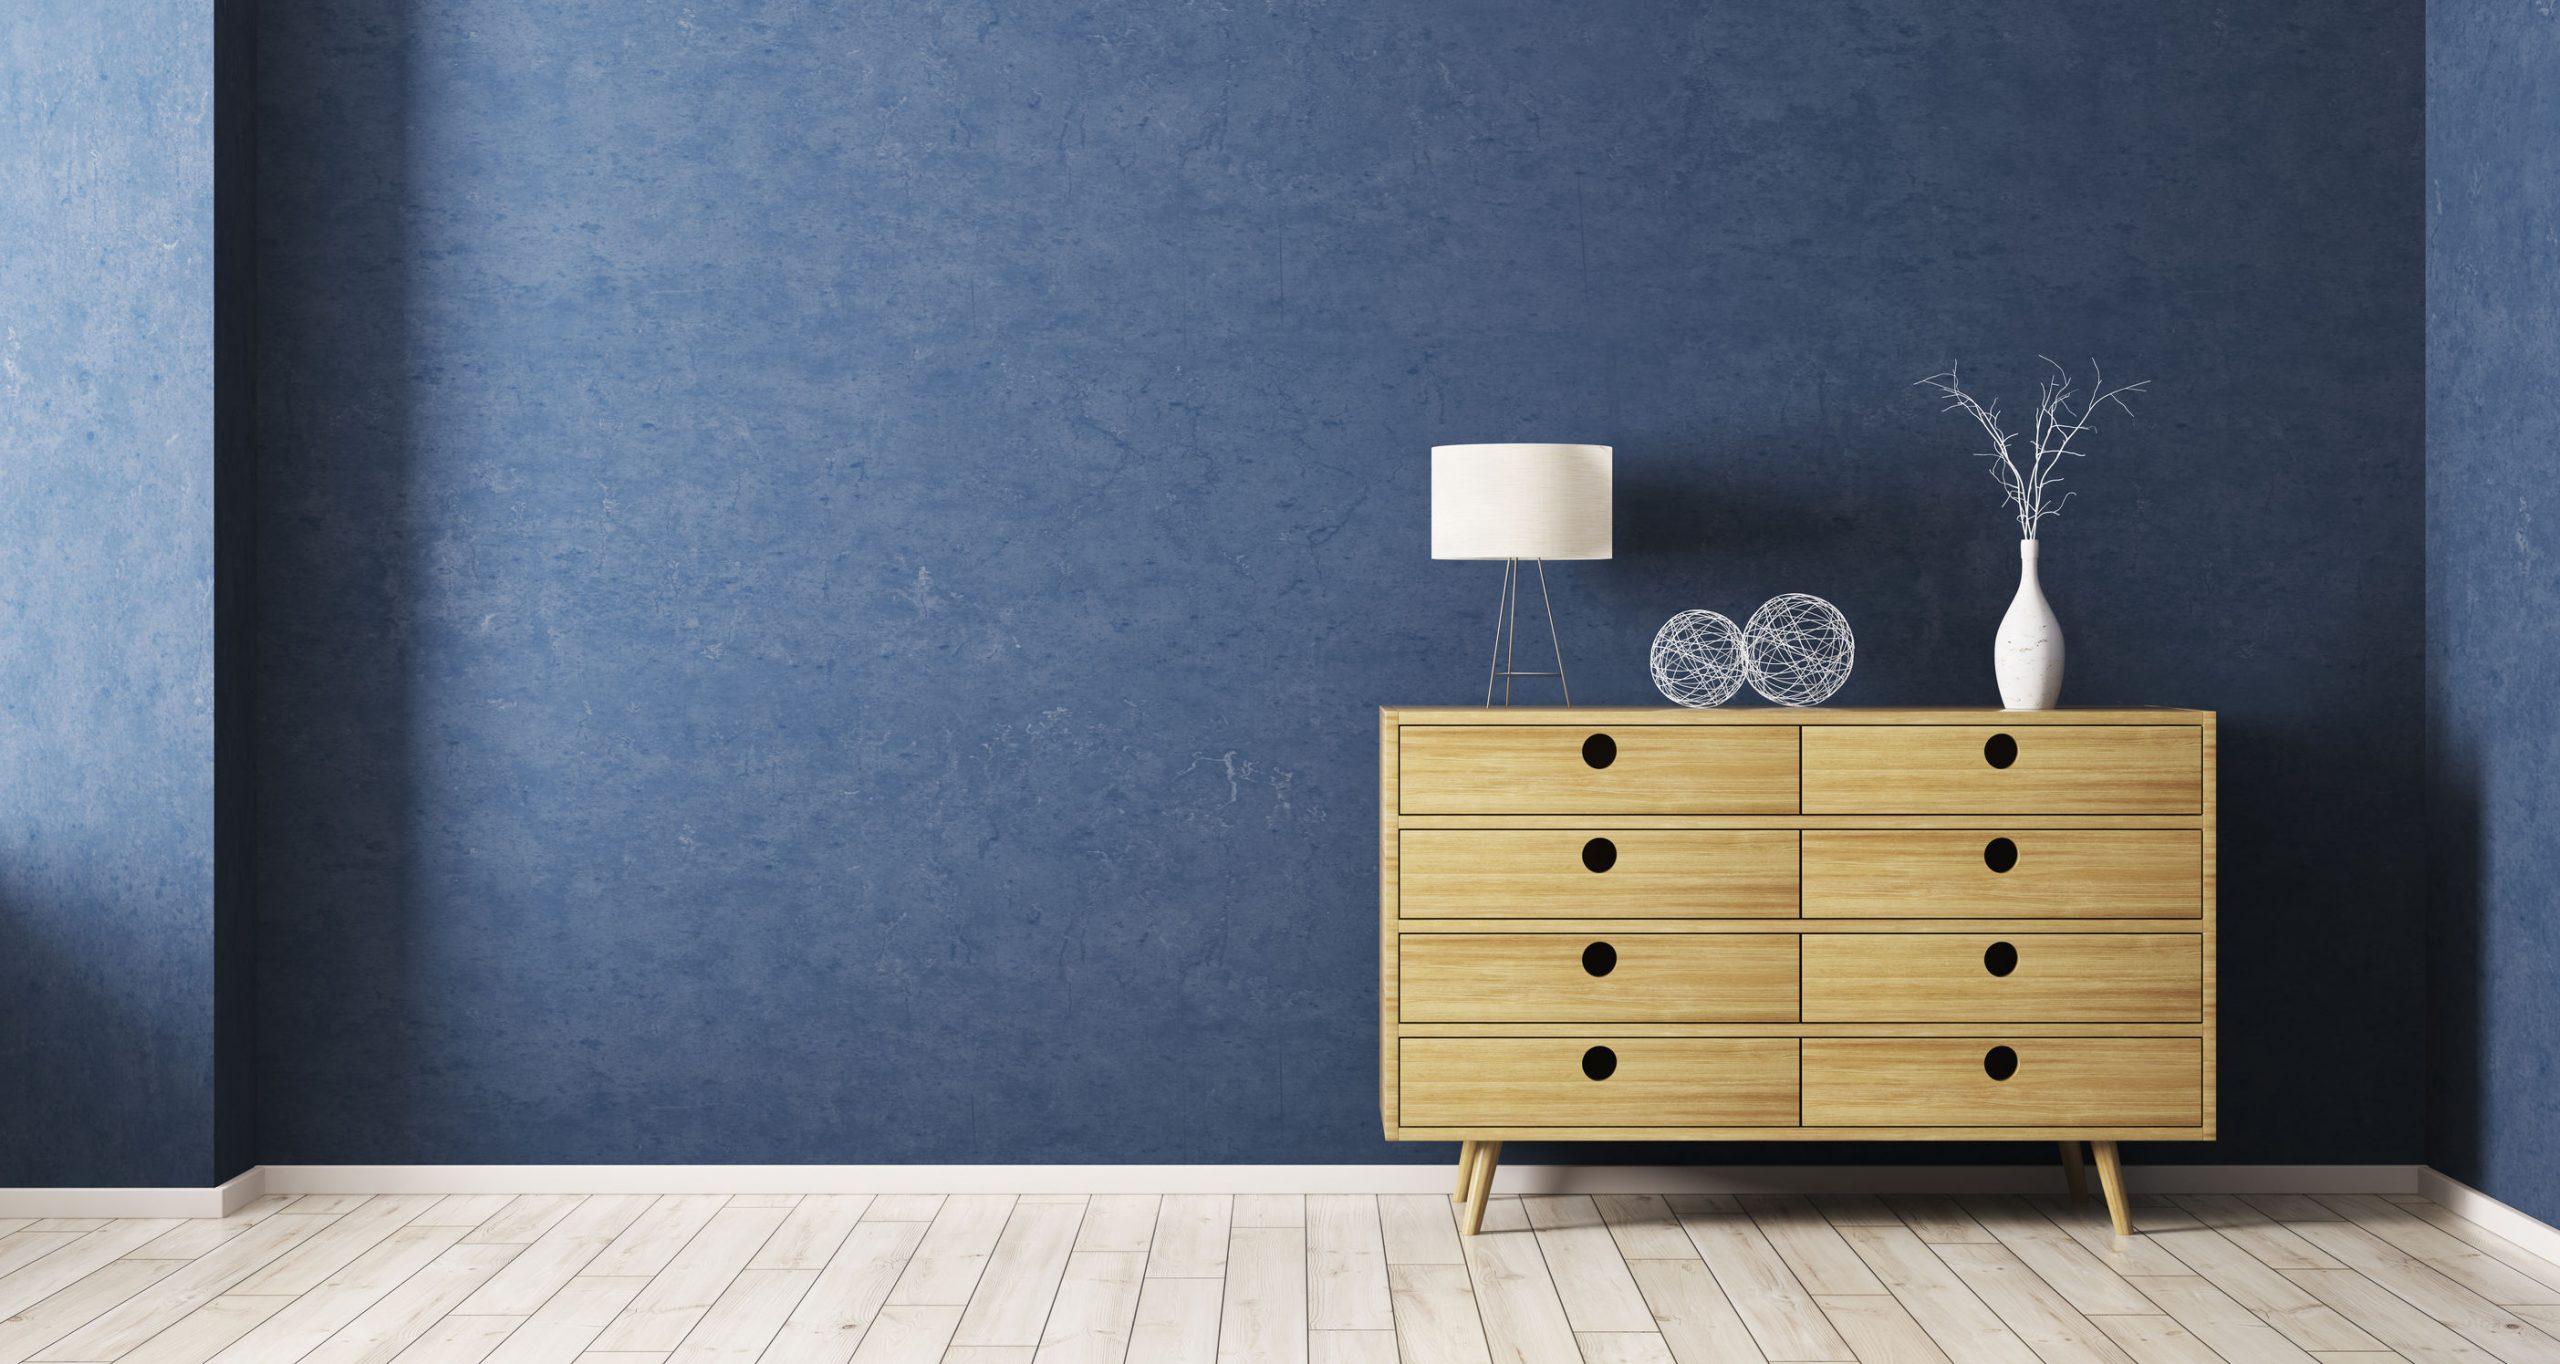 Comoda en habitacion con pared azul